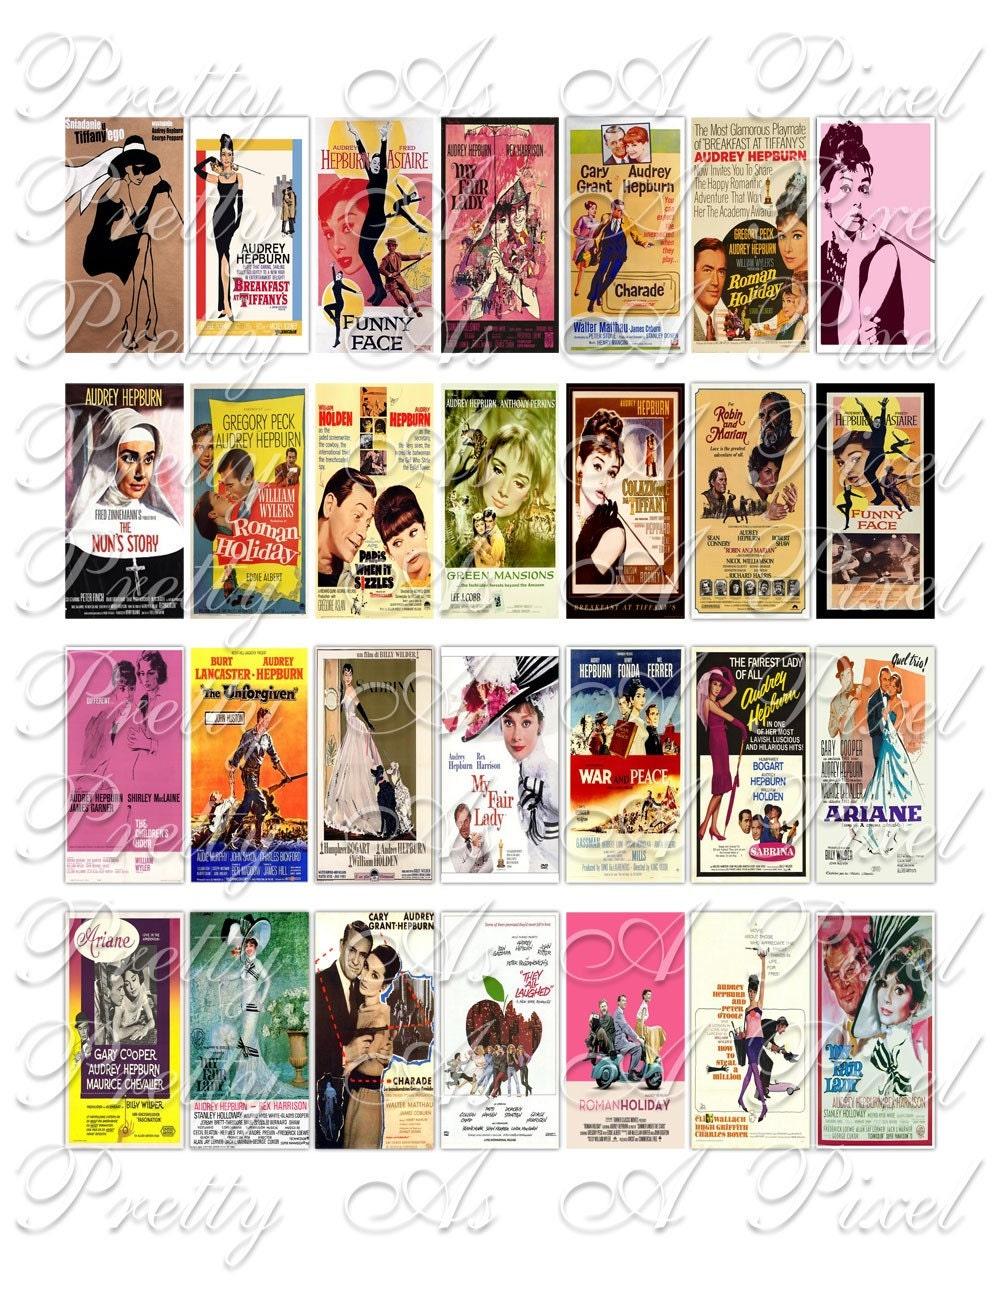 Audrey Hepburn Movie Posters 1 x 2 inch Domino Size